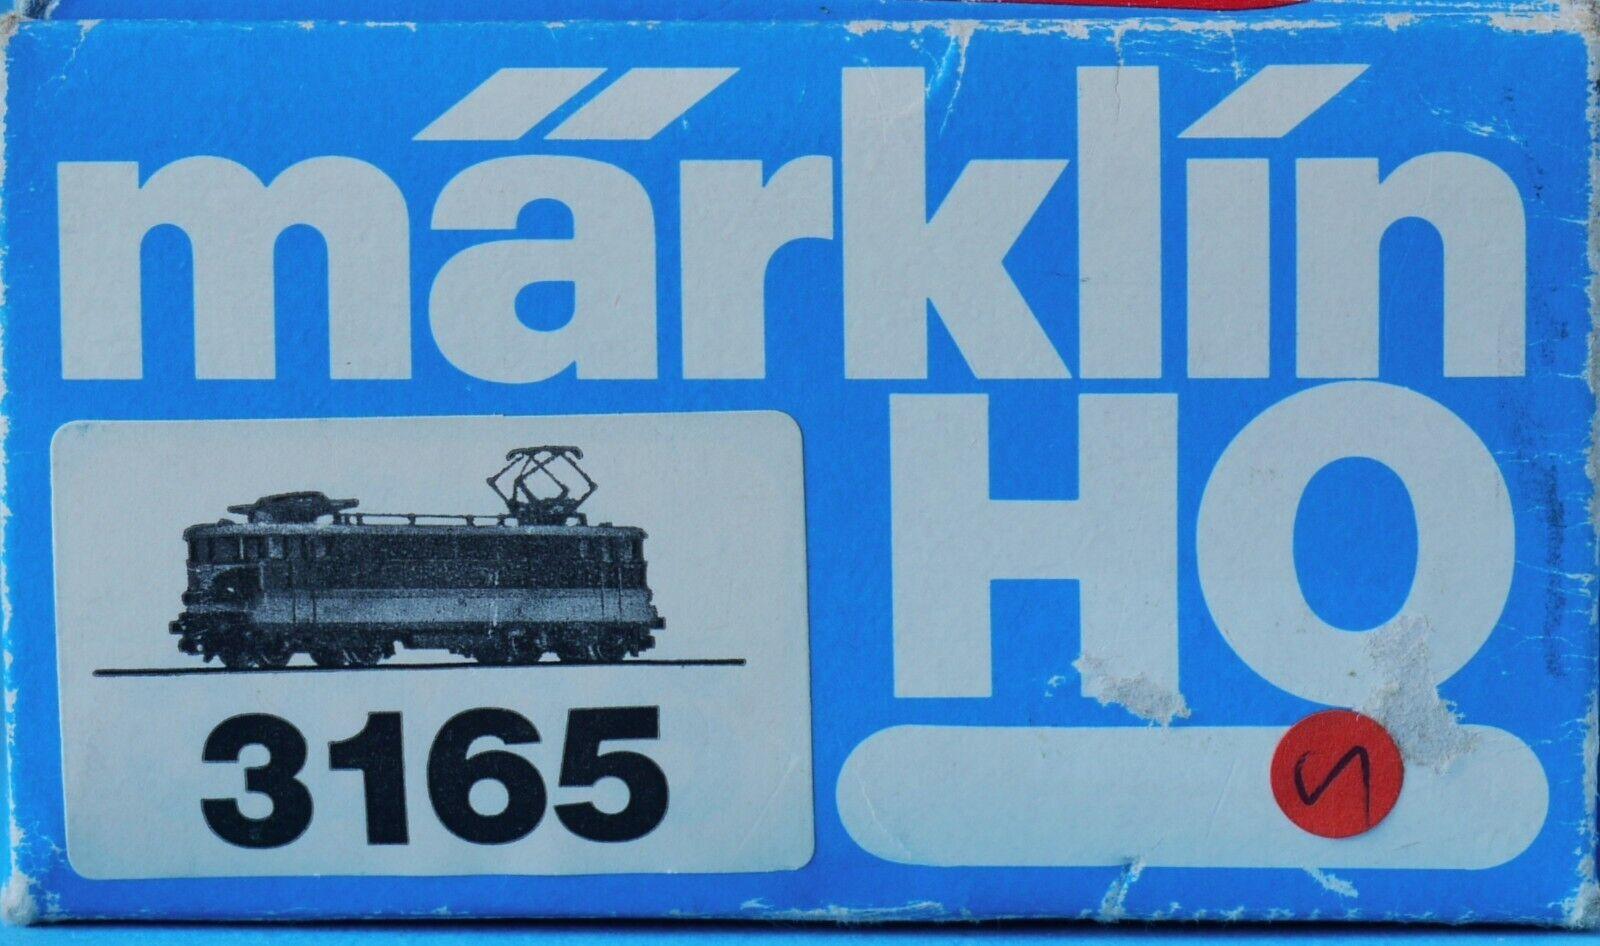 acquista marca MARKLIN 3165 HO GAUGE ELEKTROLOKOMOTIVE ELECTRIC LOCOMOTIVE SNCF BB9200 BB9200 BB9200 BB 9280  incentivi promozionali